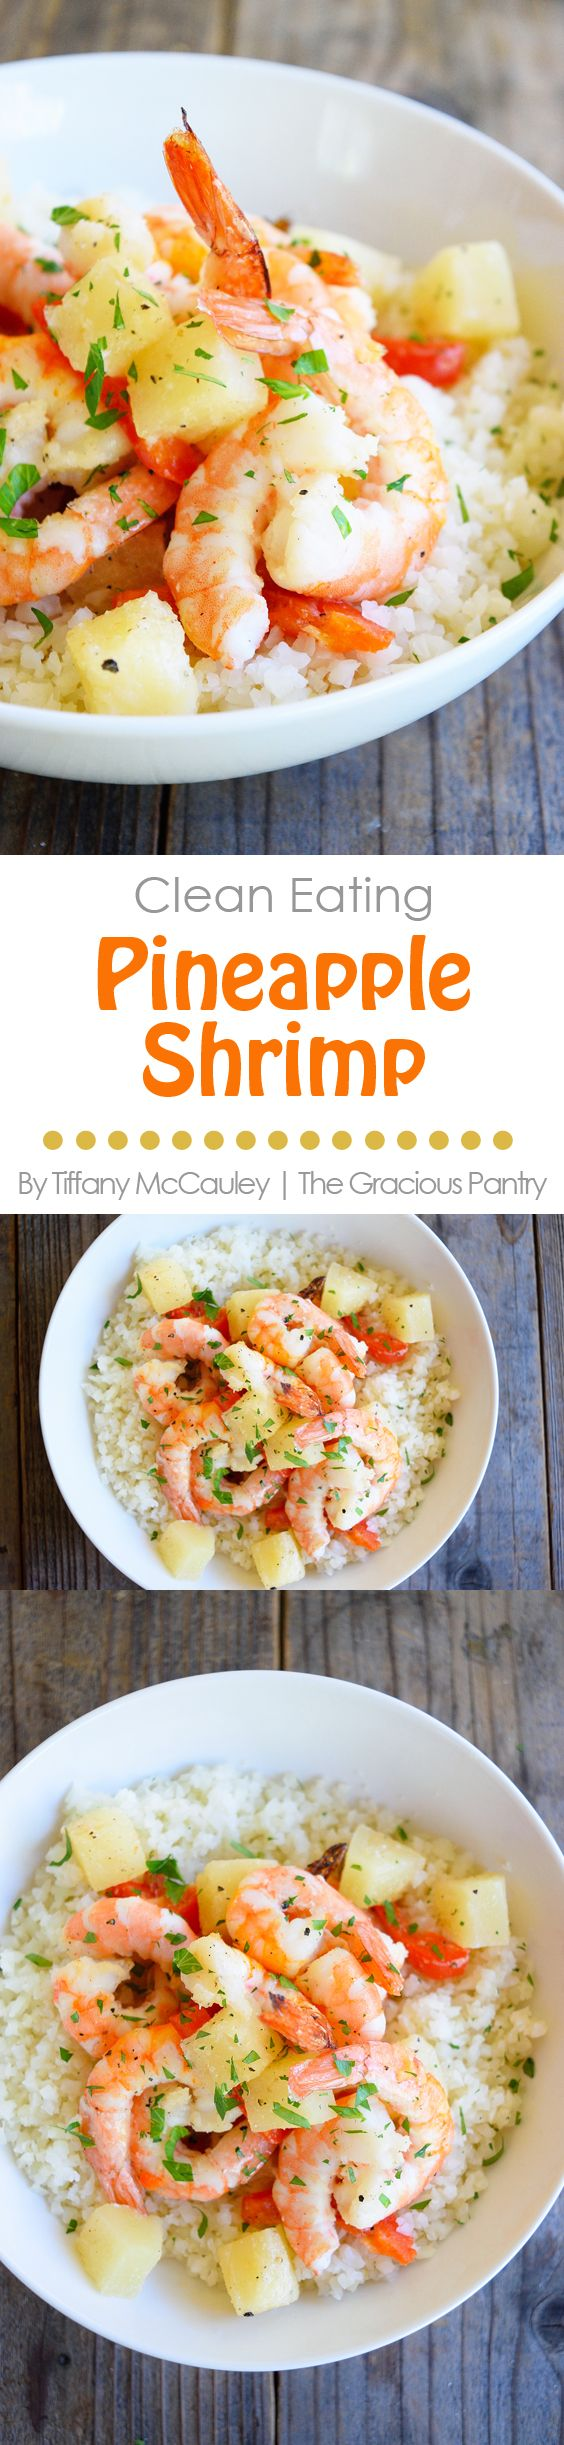 Clean Eating Recipes | Pineapple Shrimp | Shrimp Recipes | Seafood Recipes ~ https://www.thegraciouspantry.com